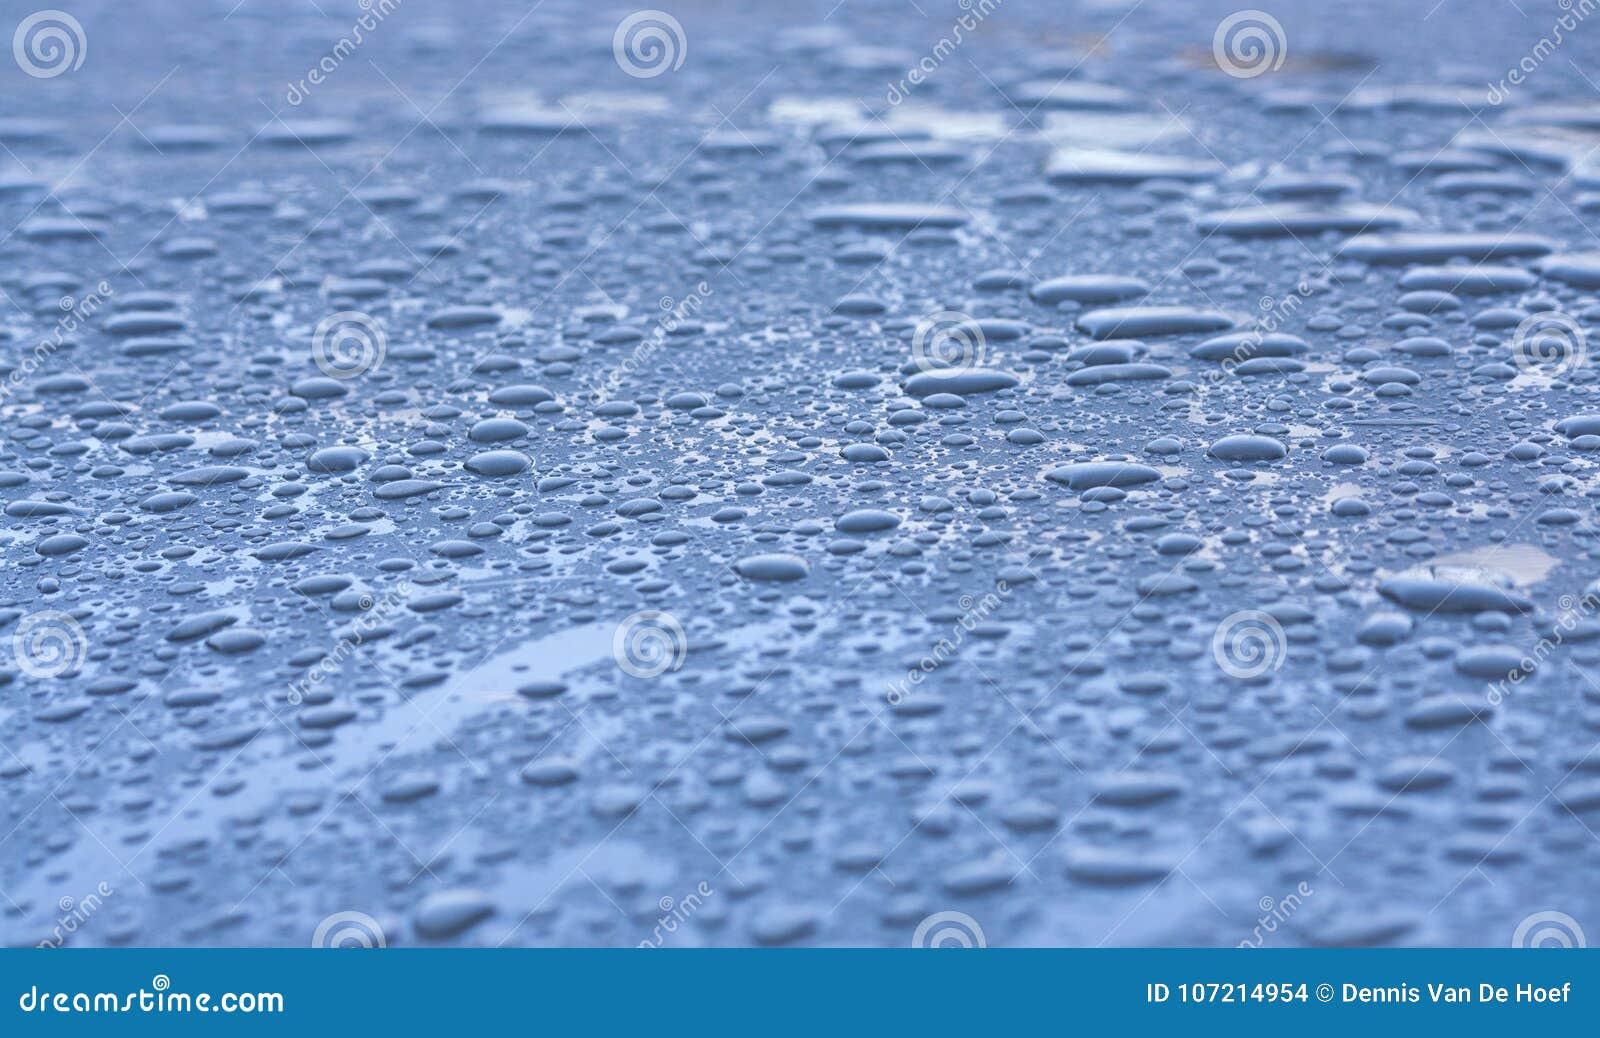 Vatten tappar på taket av en bil